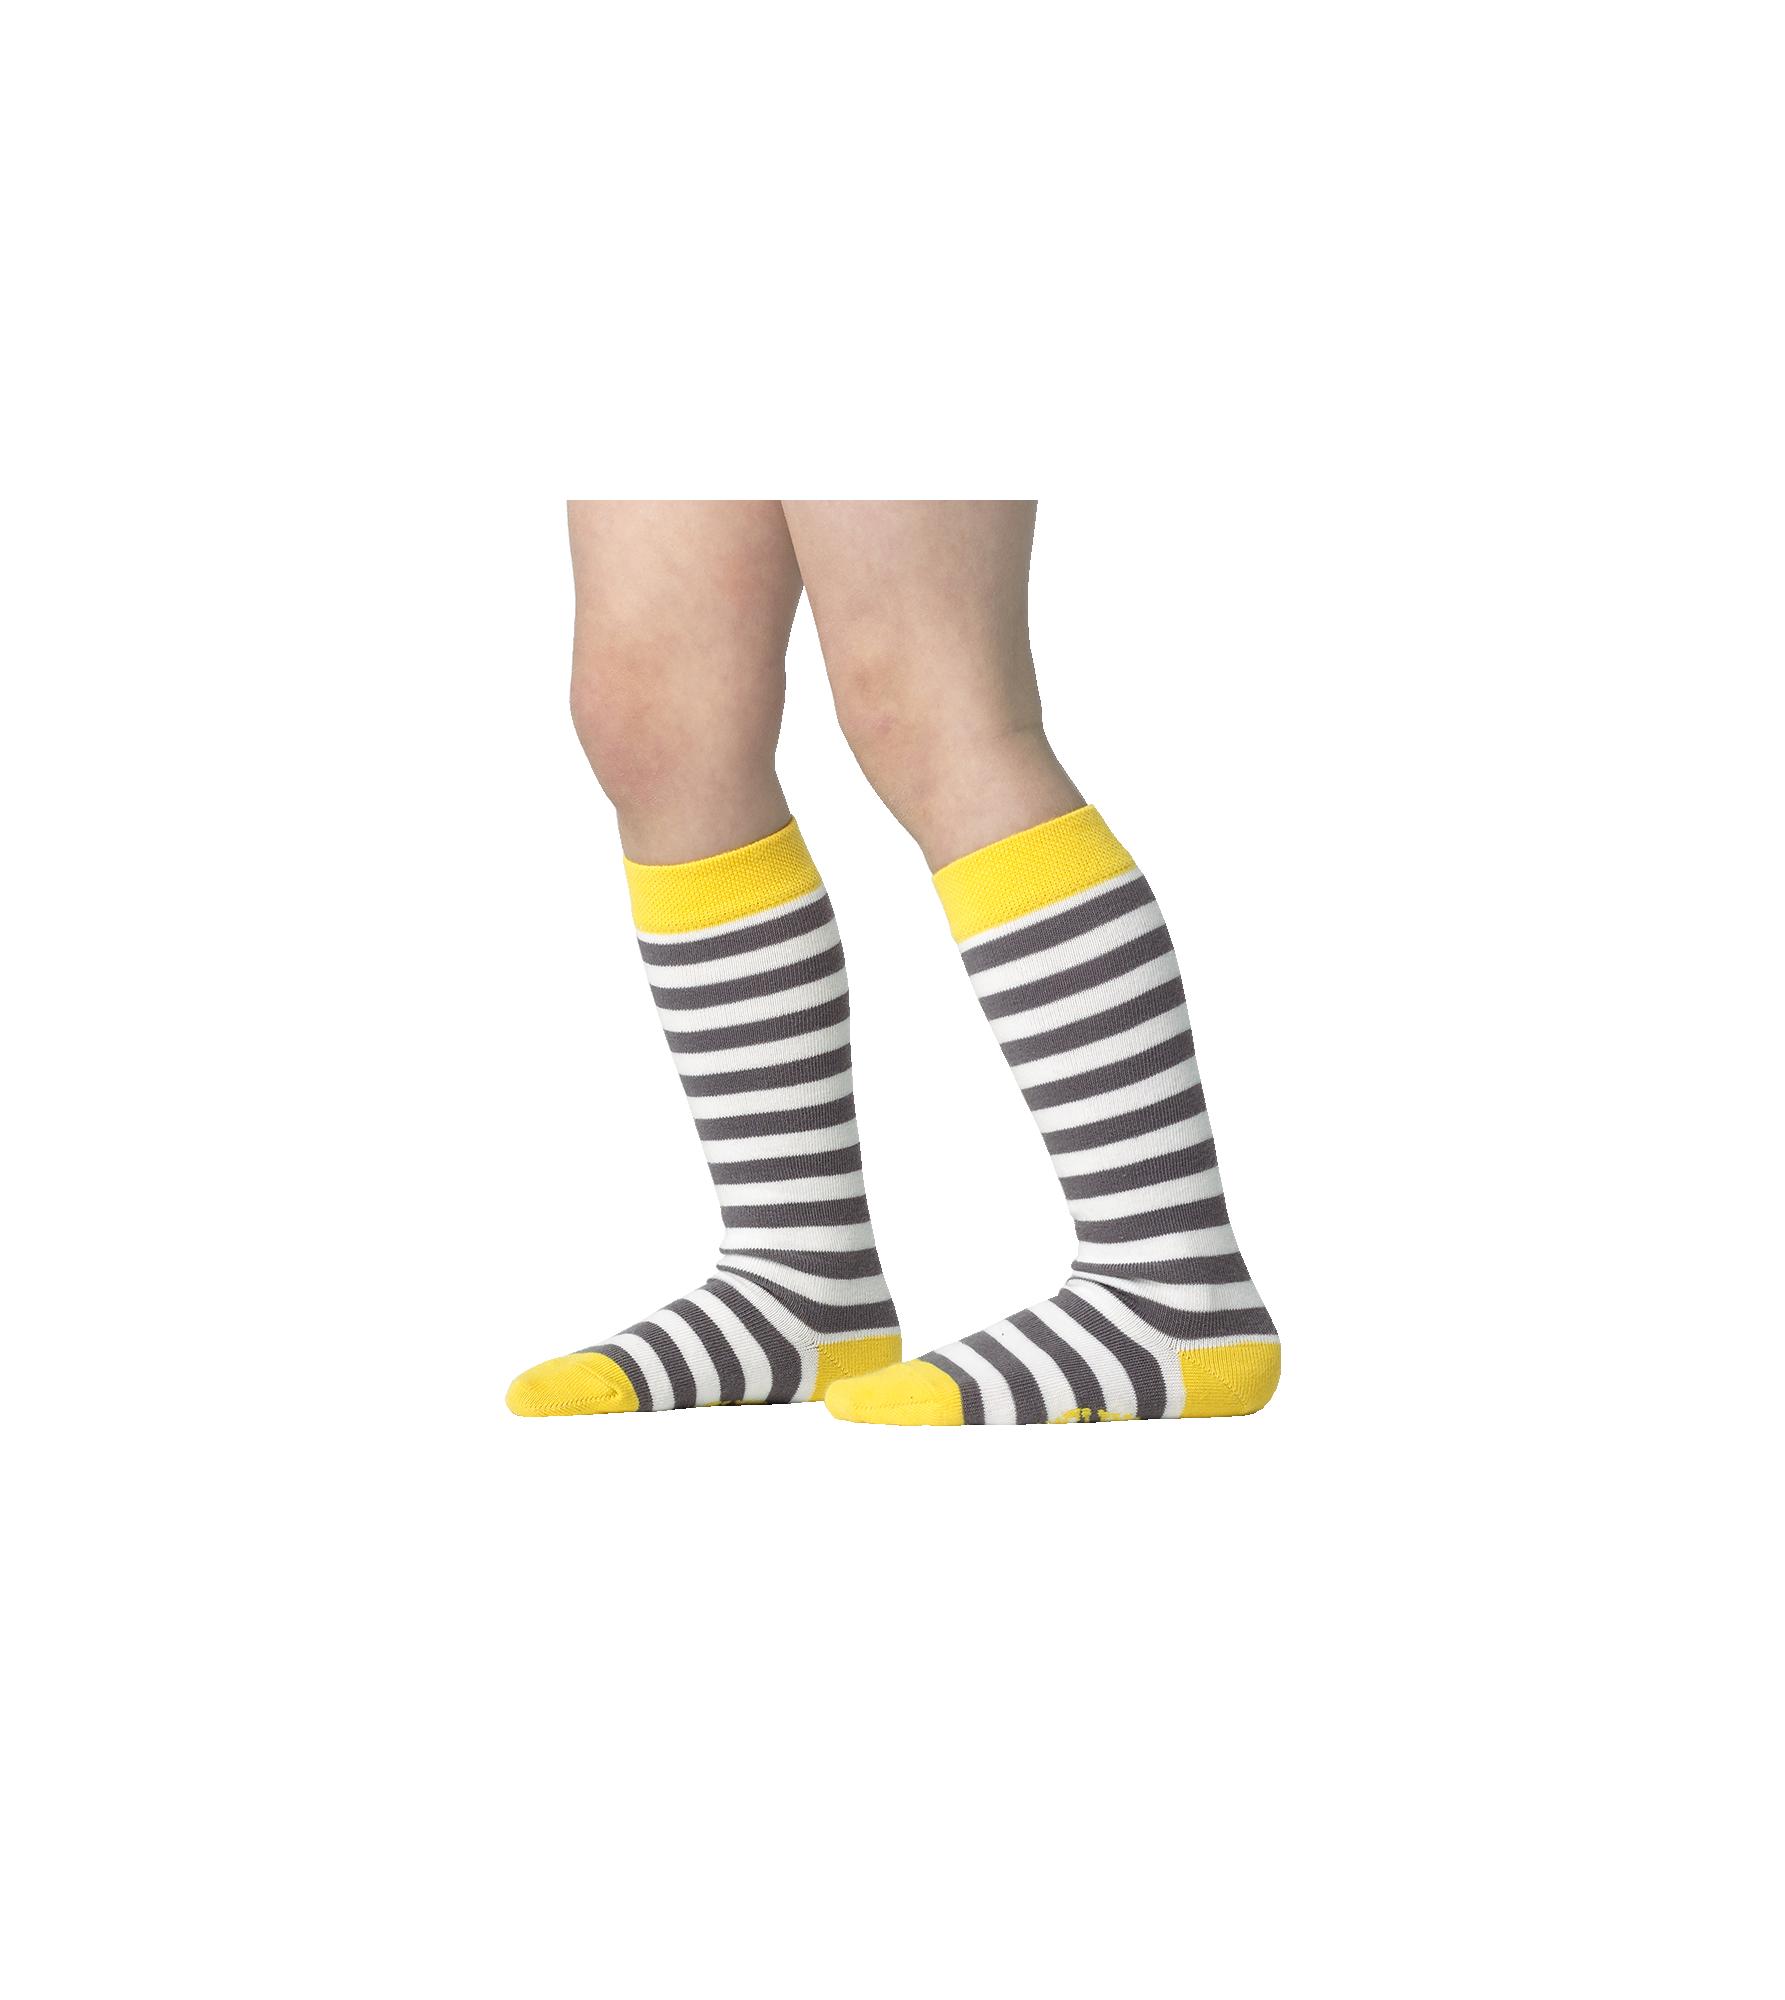 CUTOUT_Sunshine Stripe socks.png